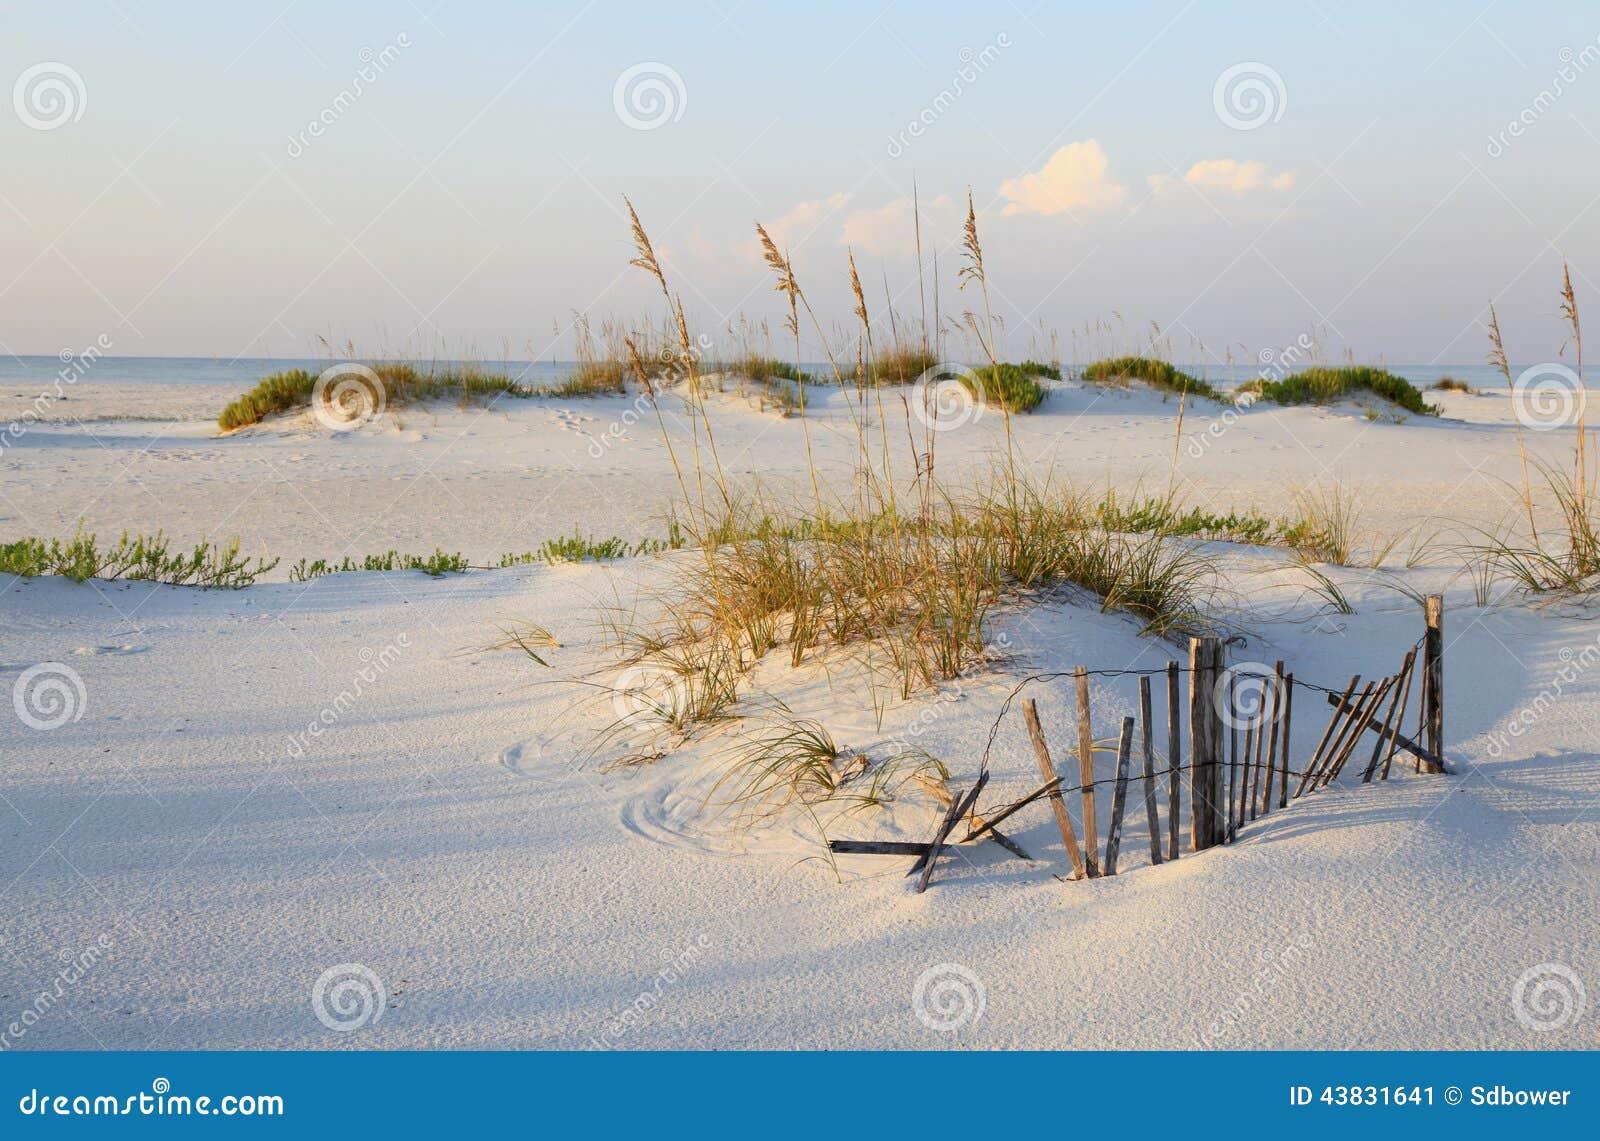 Sand Dunes and Sea Oats on a Pristine Florida Beach